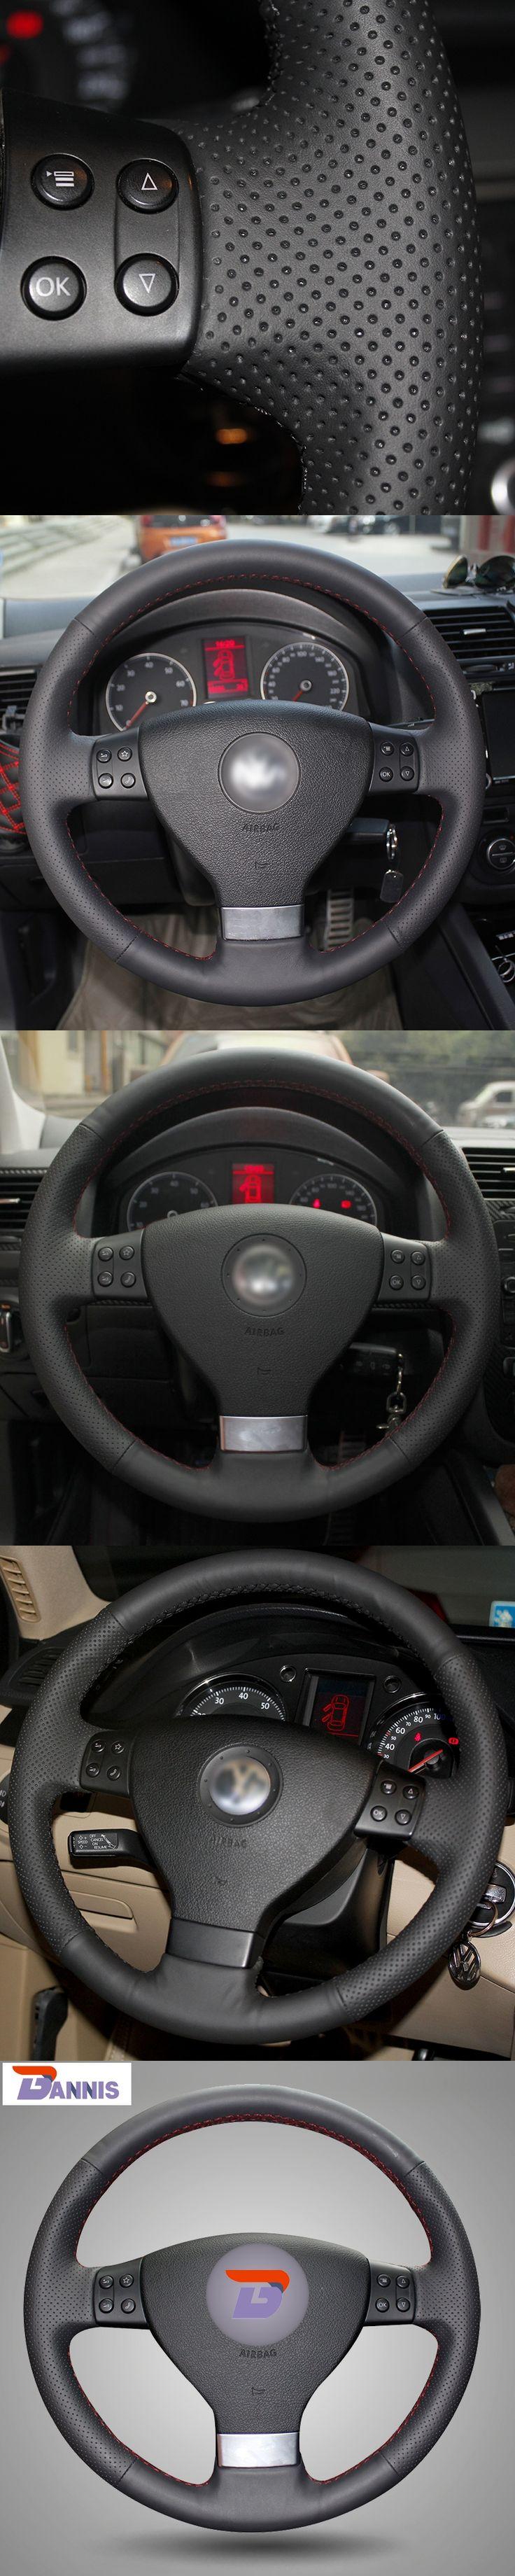 Black Artificial Leather  Steering Wheel Cover for Volkswagen Golf 5 Mk5 Sagitar Magotan VW Passat B6 Jetta 5 Mk5 Tiguan 07-2011